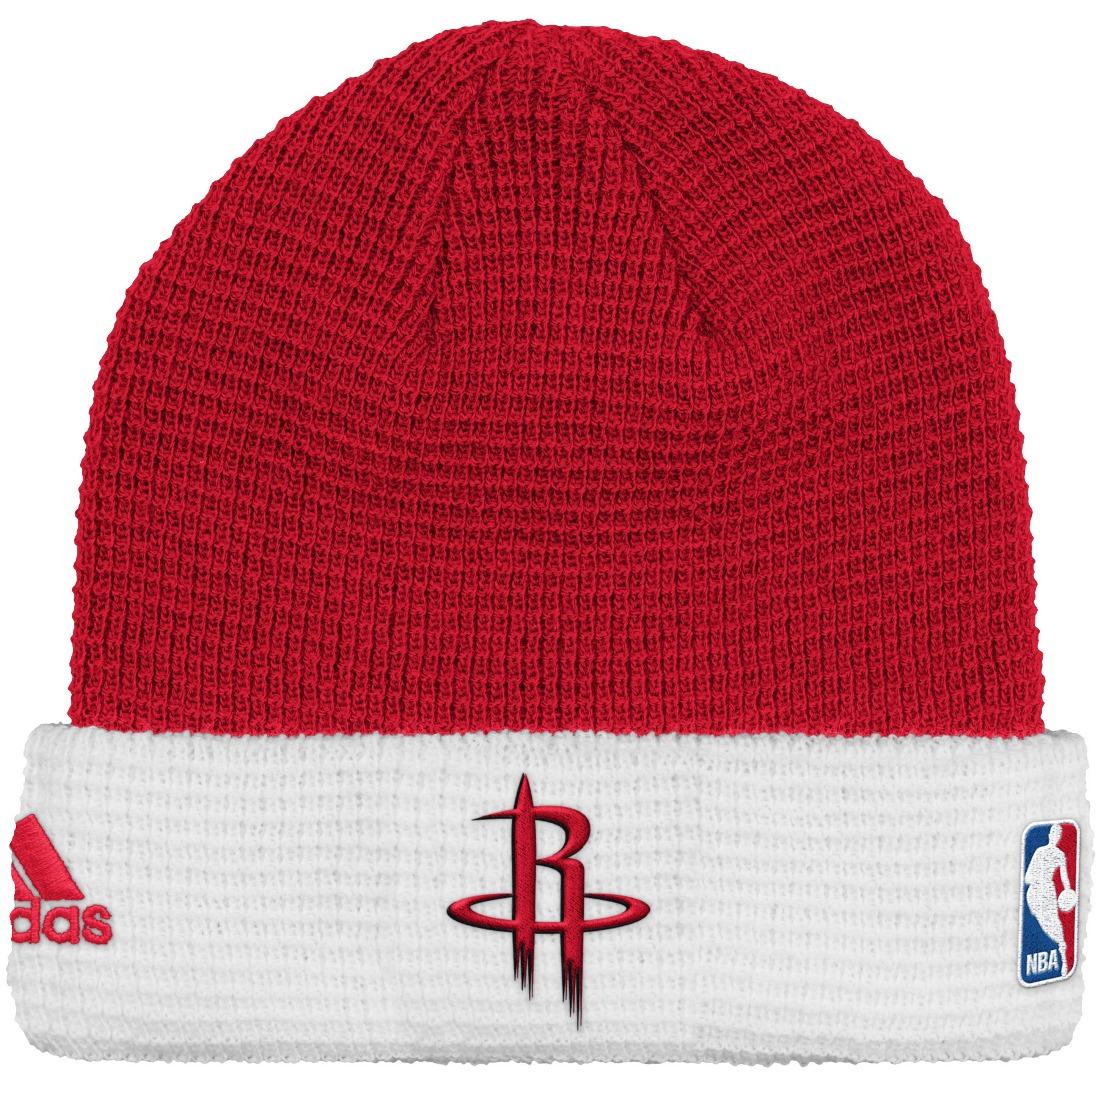 Houston Rockets Adidas NBA 2015 Authentic Team Cuffed Knit Hat